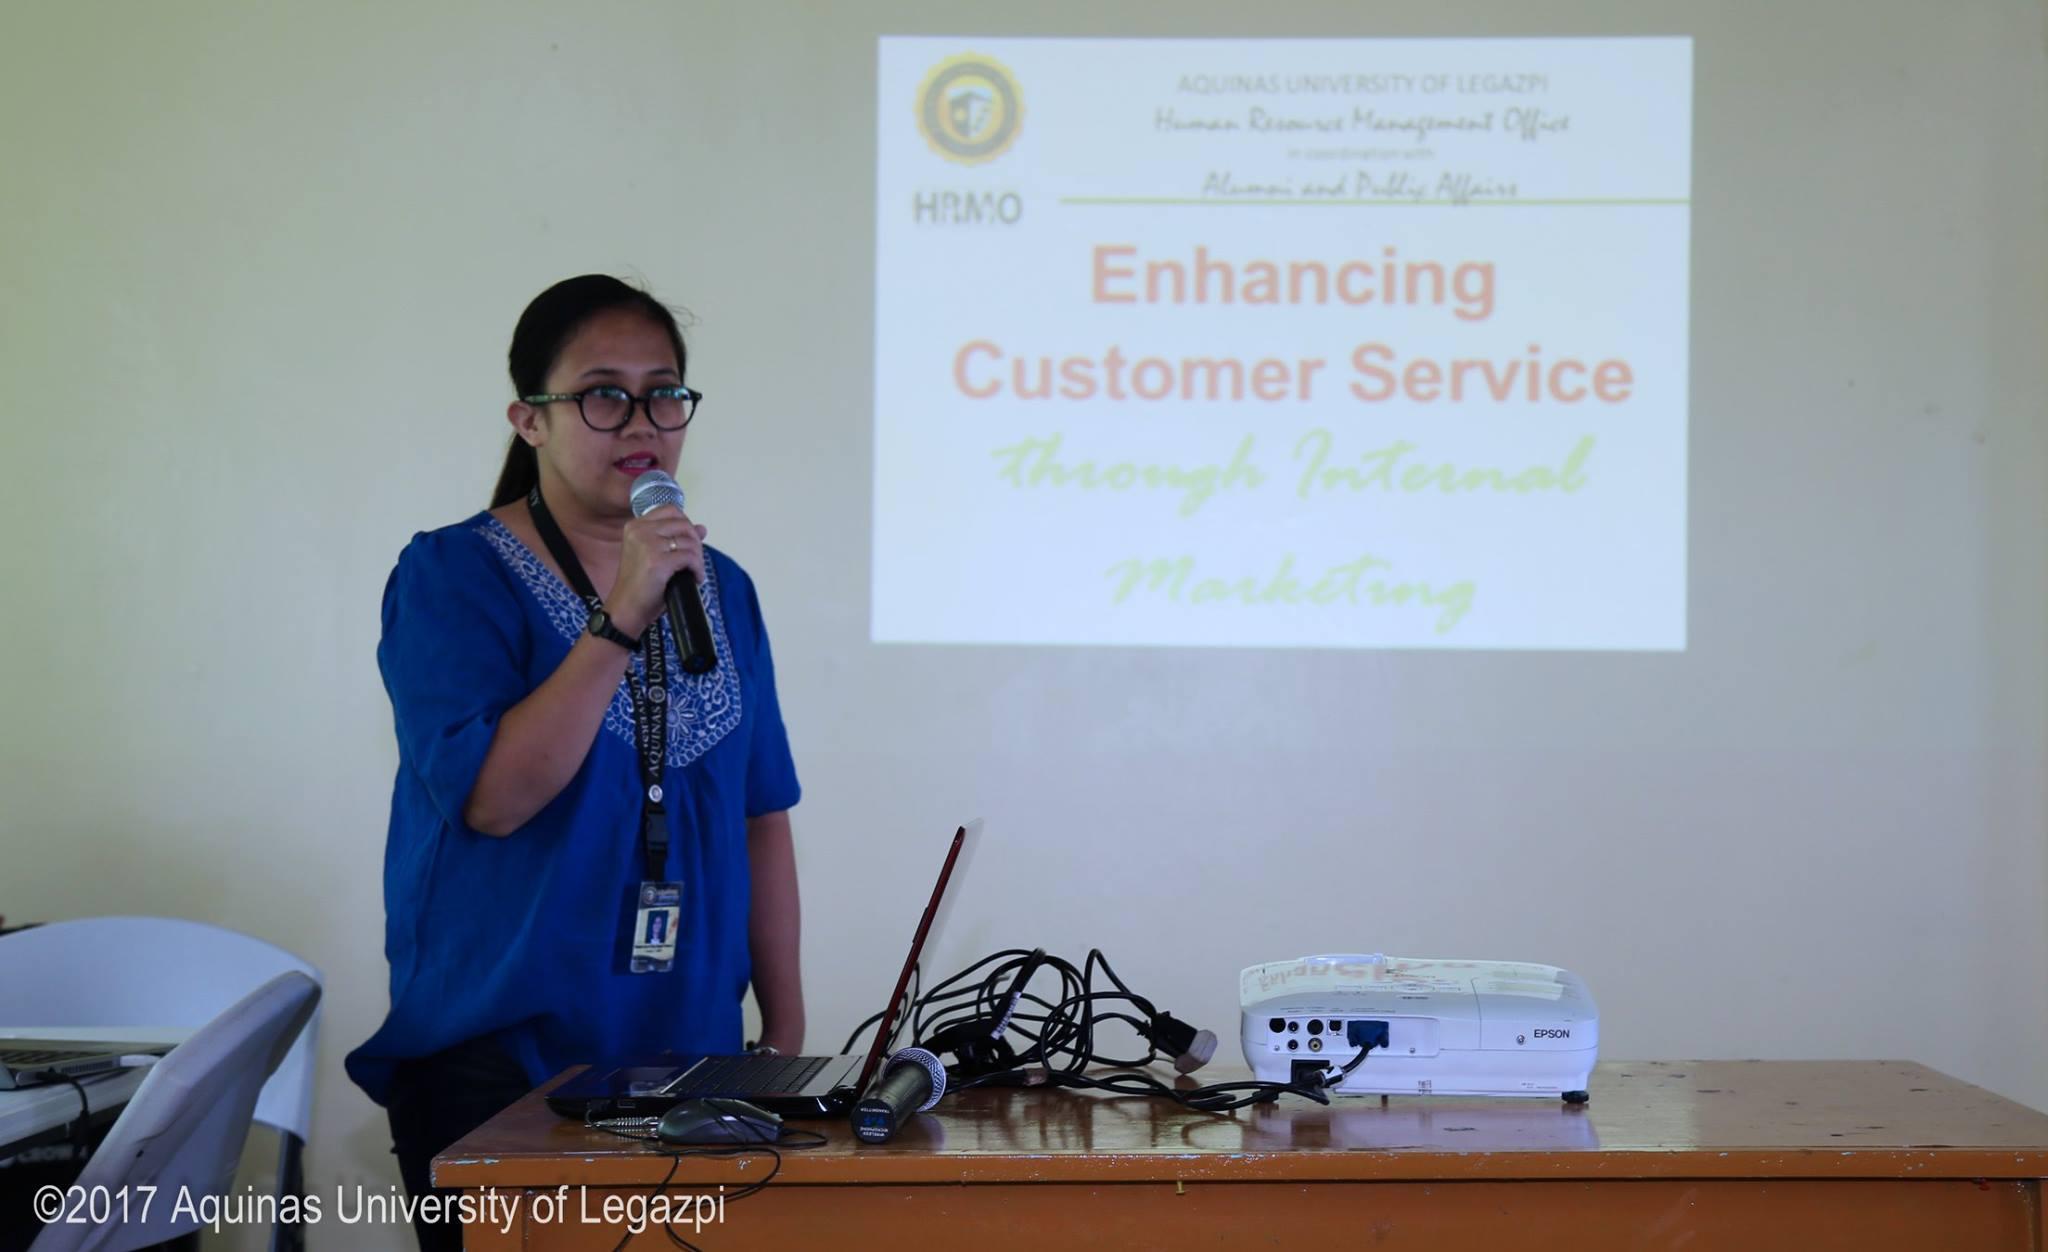 Enhancing Customer Service Through Internal Marketing